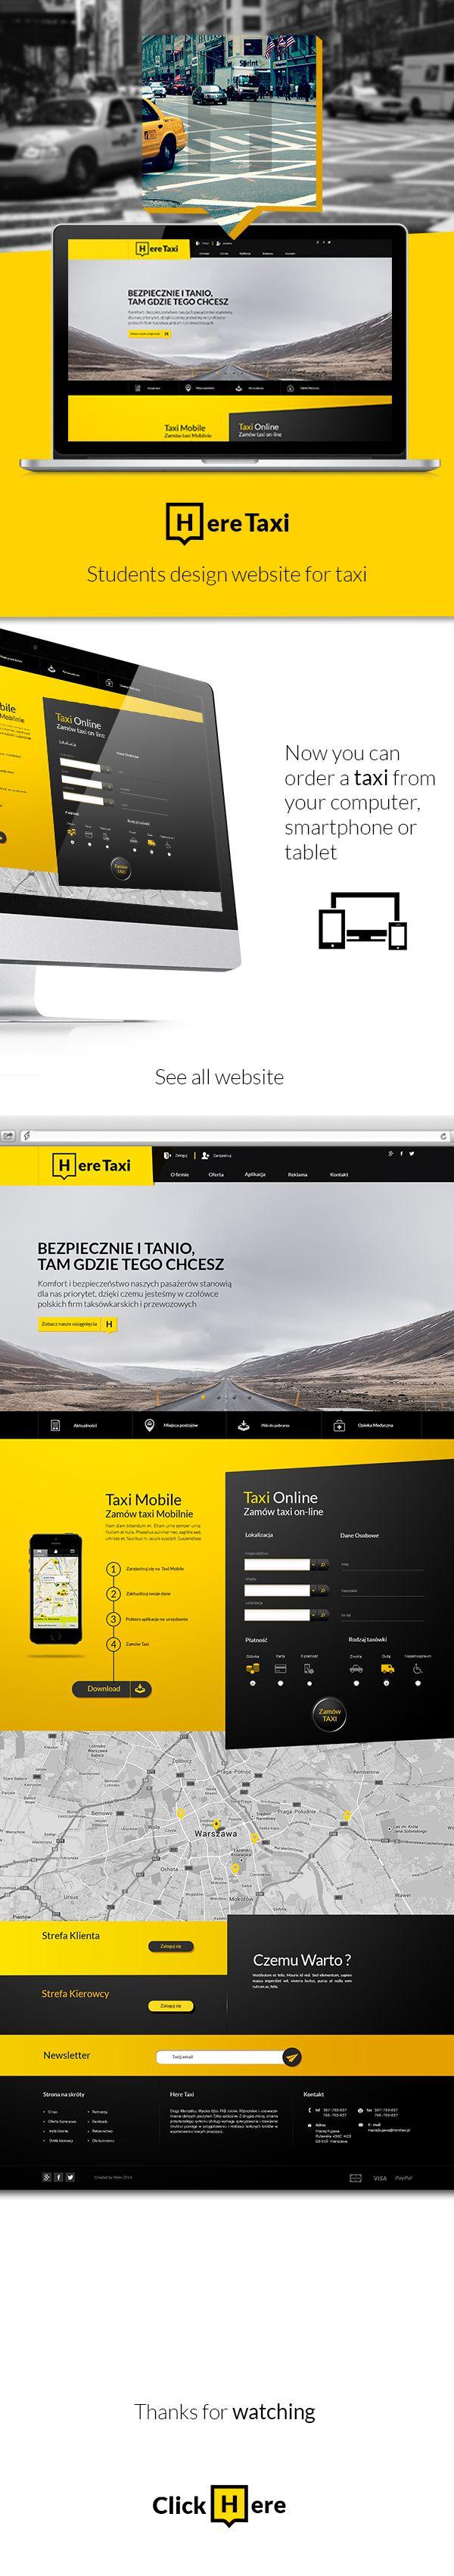 HereTaxi website by Piotr Dziechciarski, via Behance